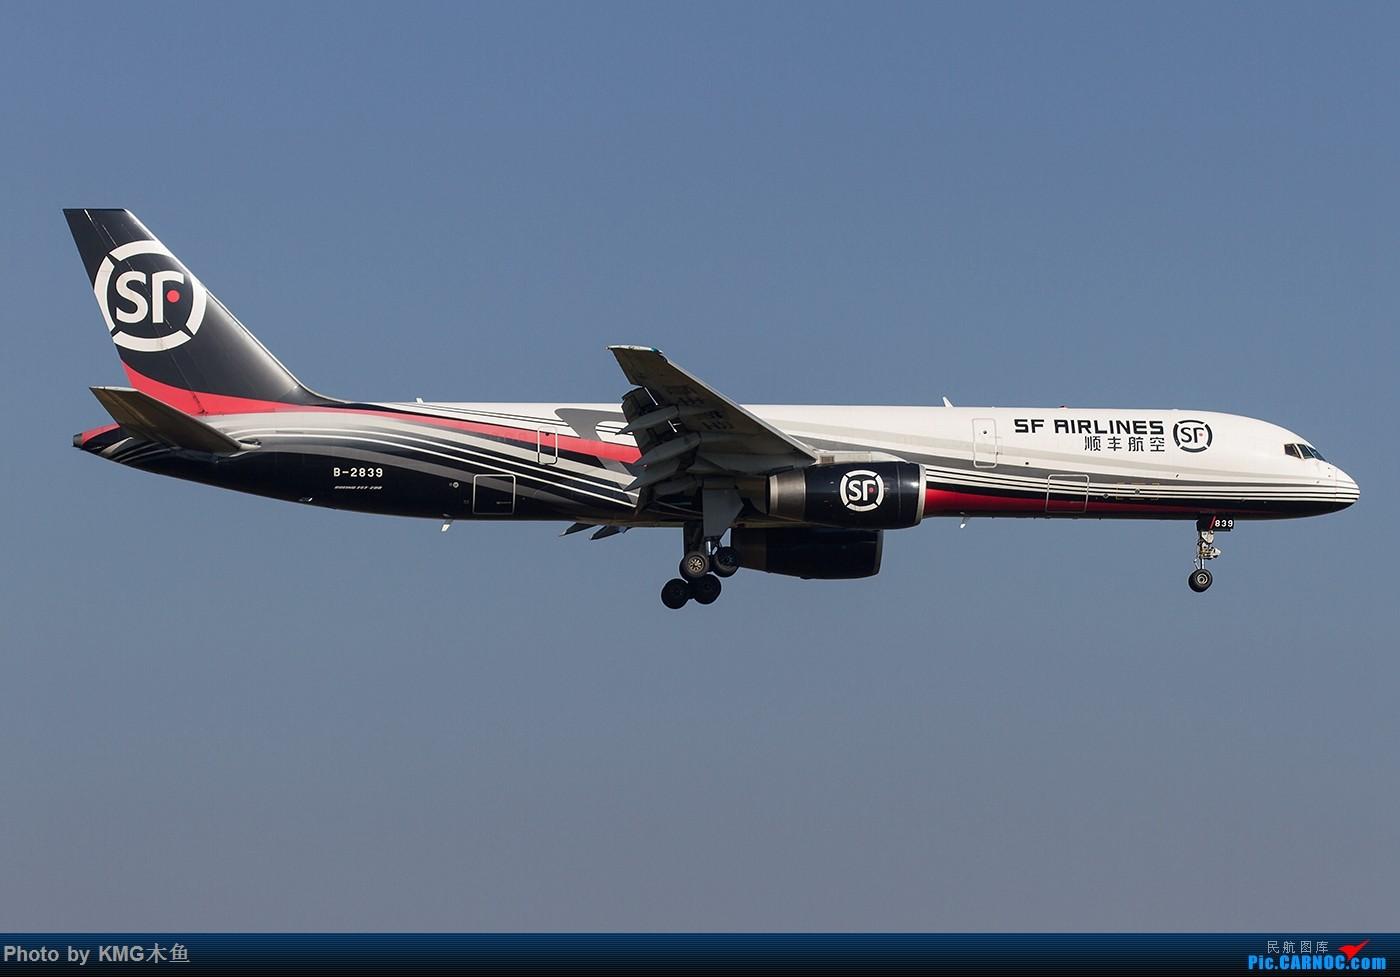 Re:[原创]【昆明飞友会-KMG木鱼】9月的周末可不可以来次大晴天,我想去拍飞机 BOEING 757-200 B-2839 中国昆明长水国际机场